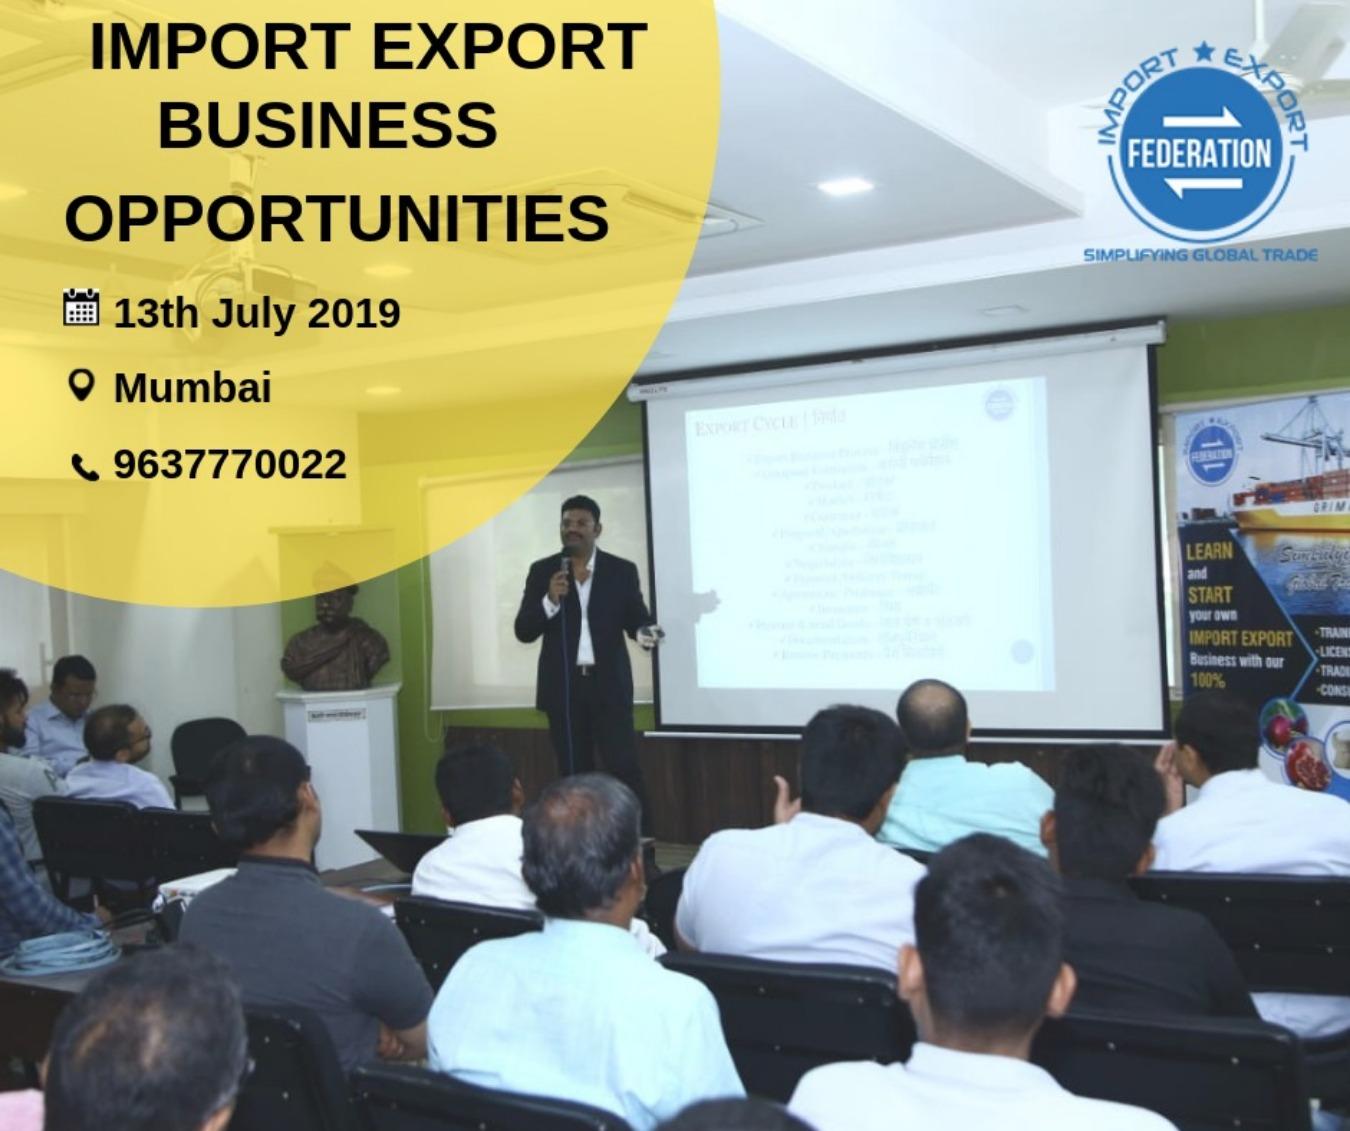 MEGA EXPORT IMPORT BUSINESS LAUNCHER MUMBAI Tickets by Import Export  Federation, 13 Jul, 2019, Mumbai Event